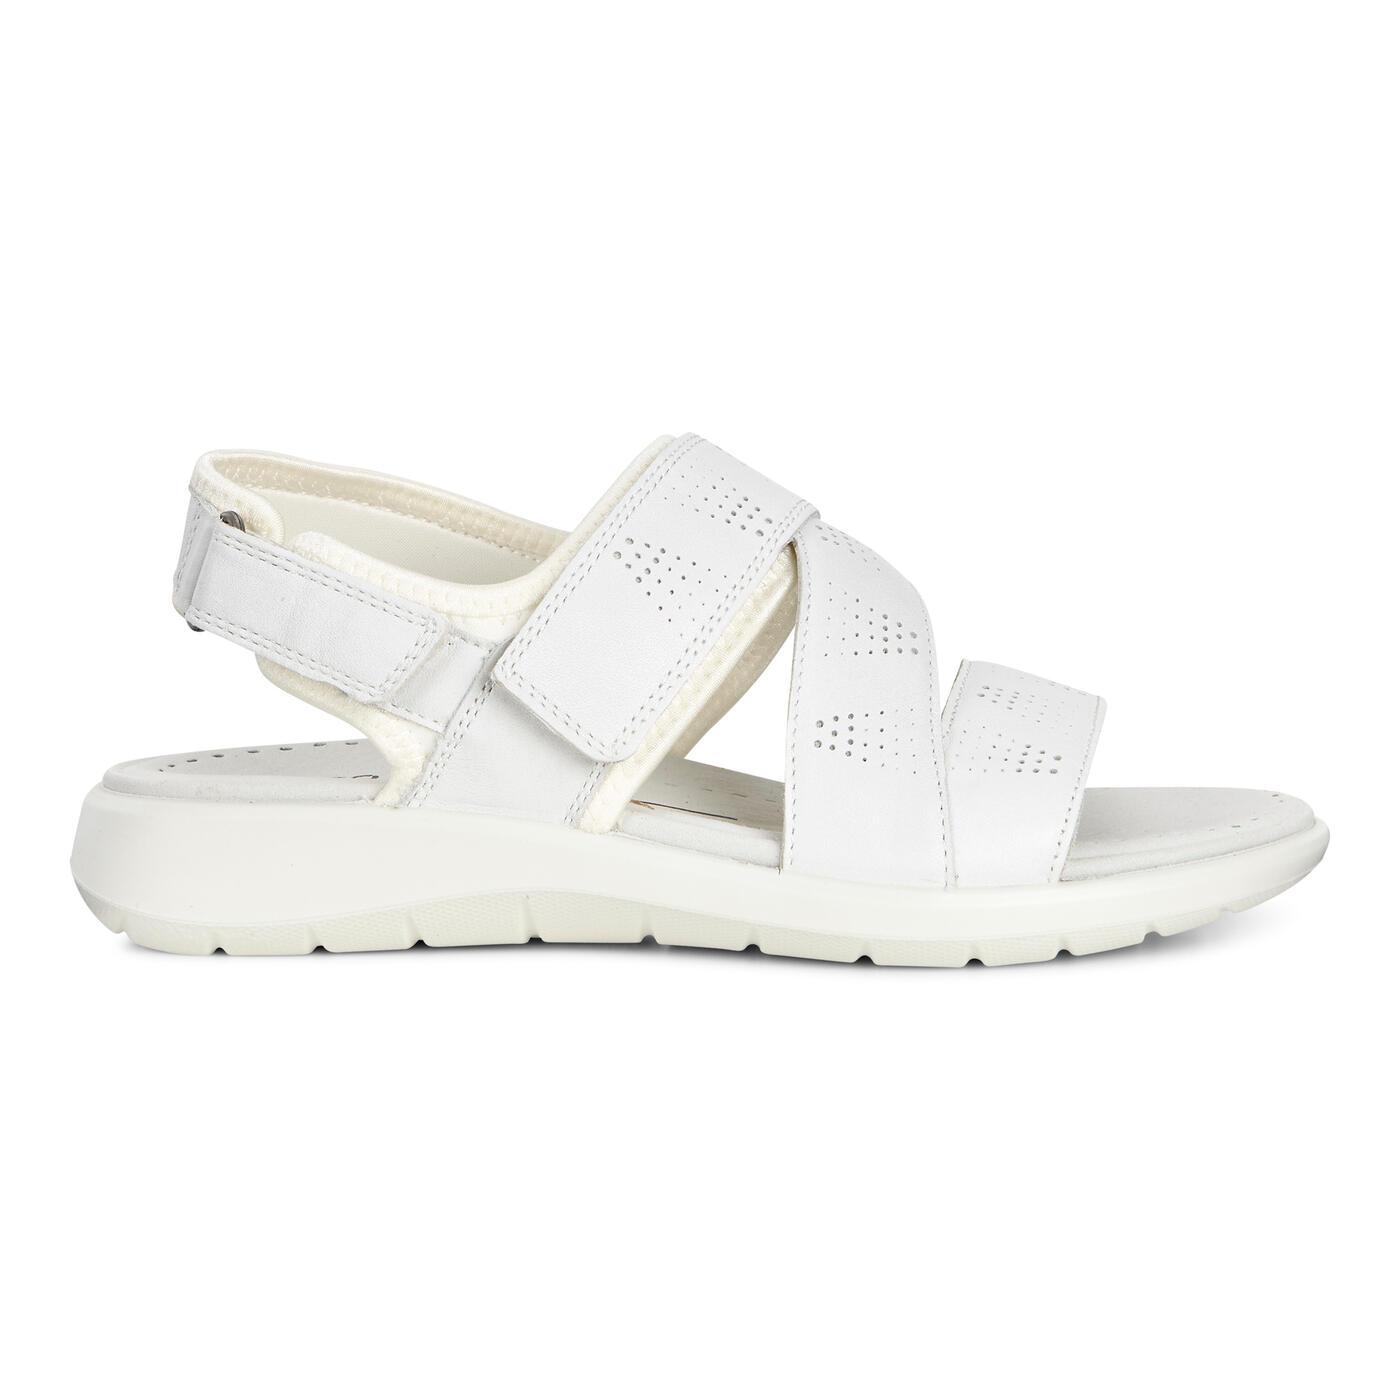 ECCO Soft 5 Cross Strap Sandal